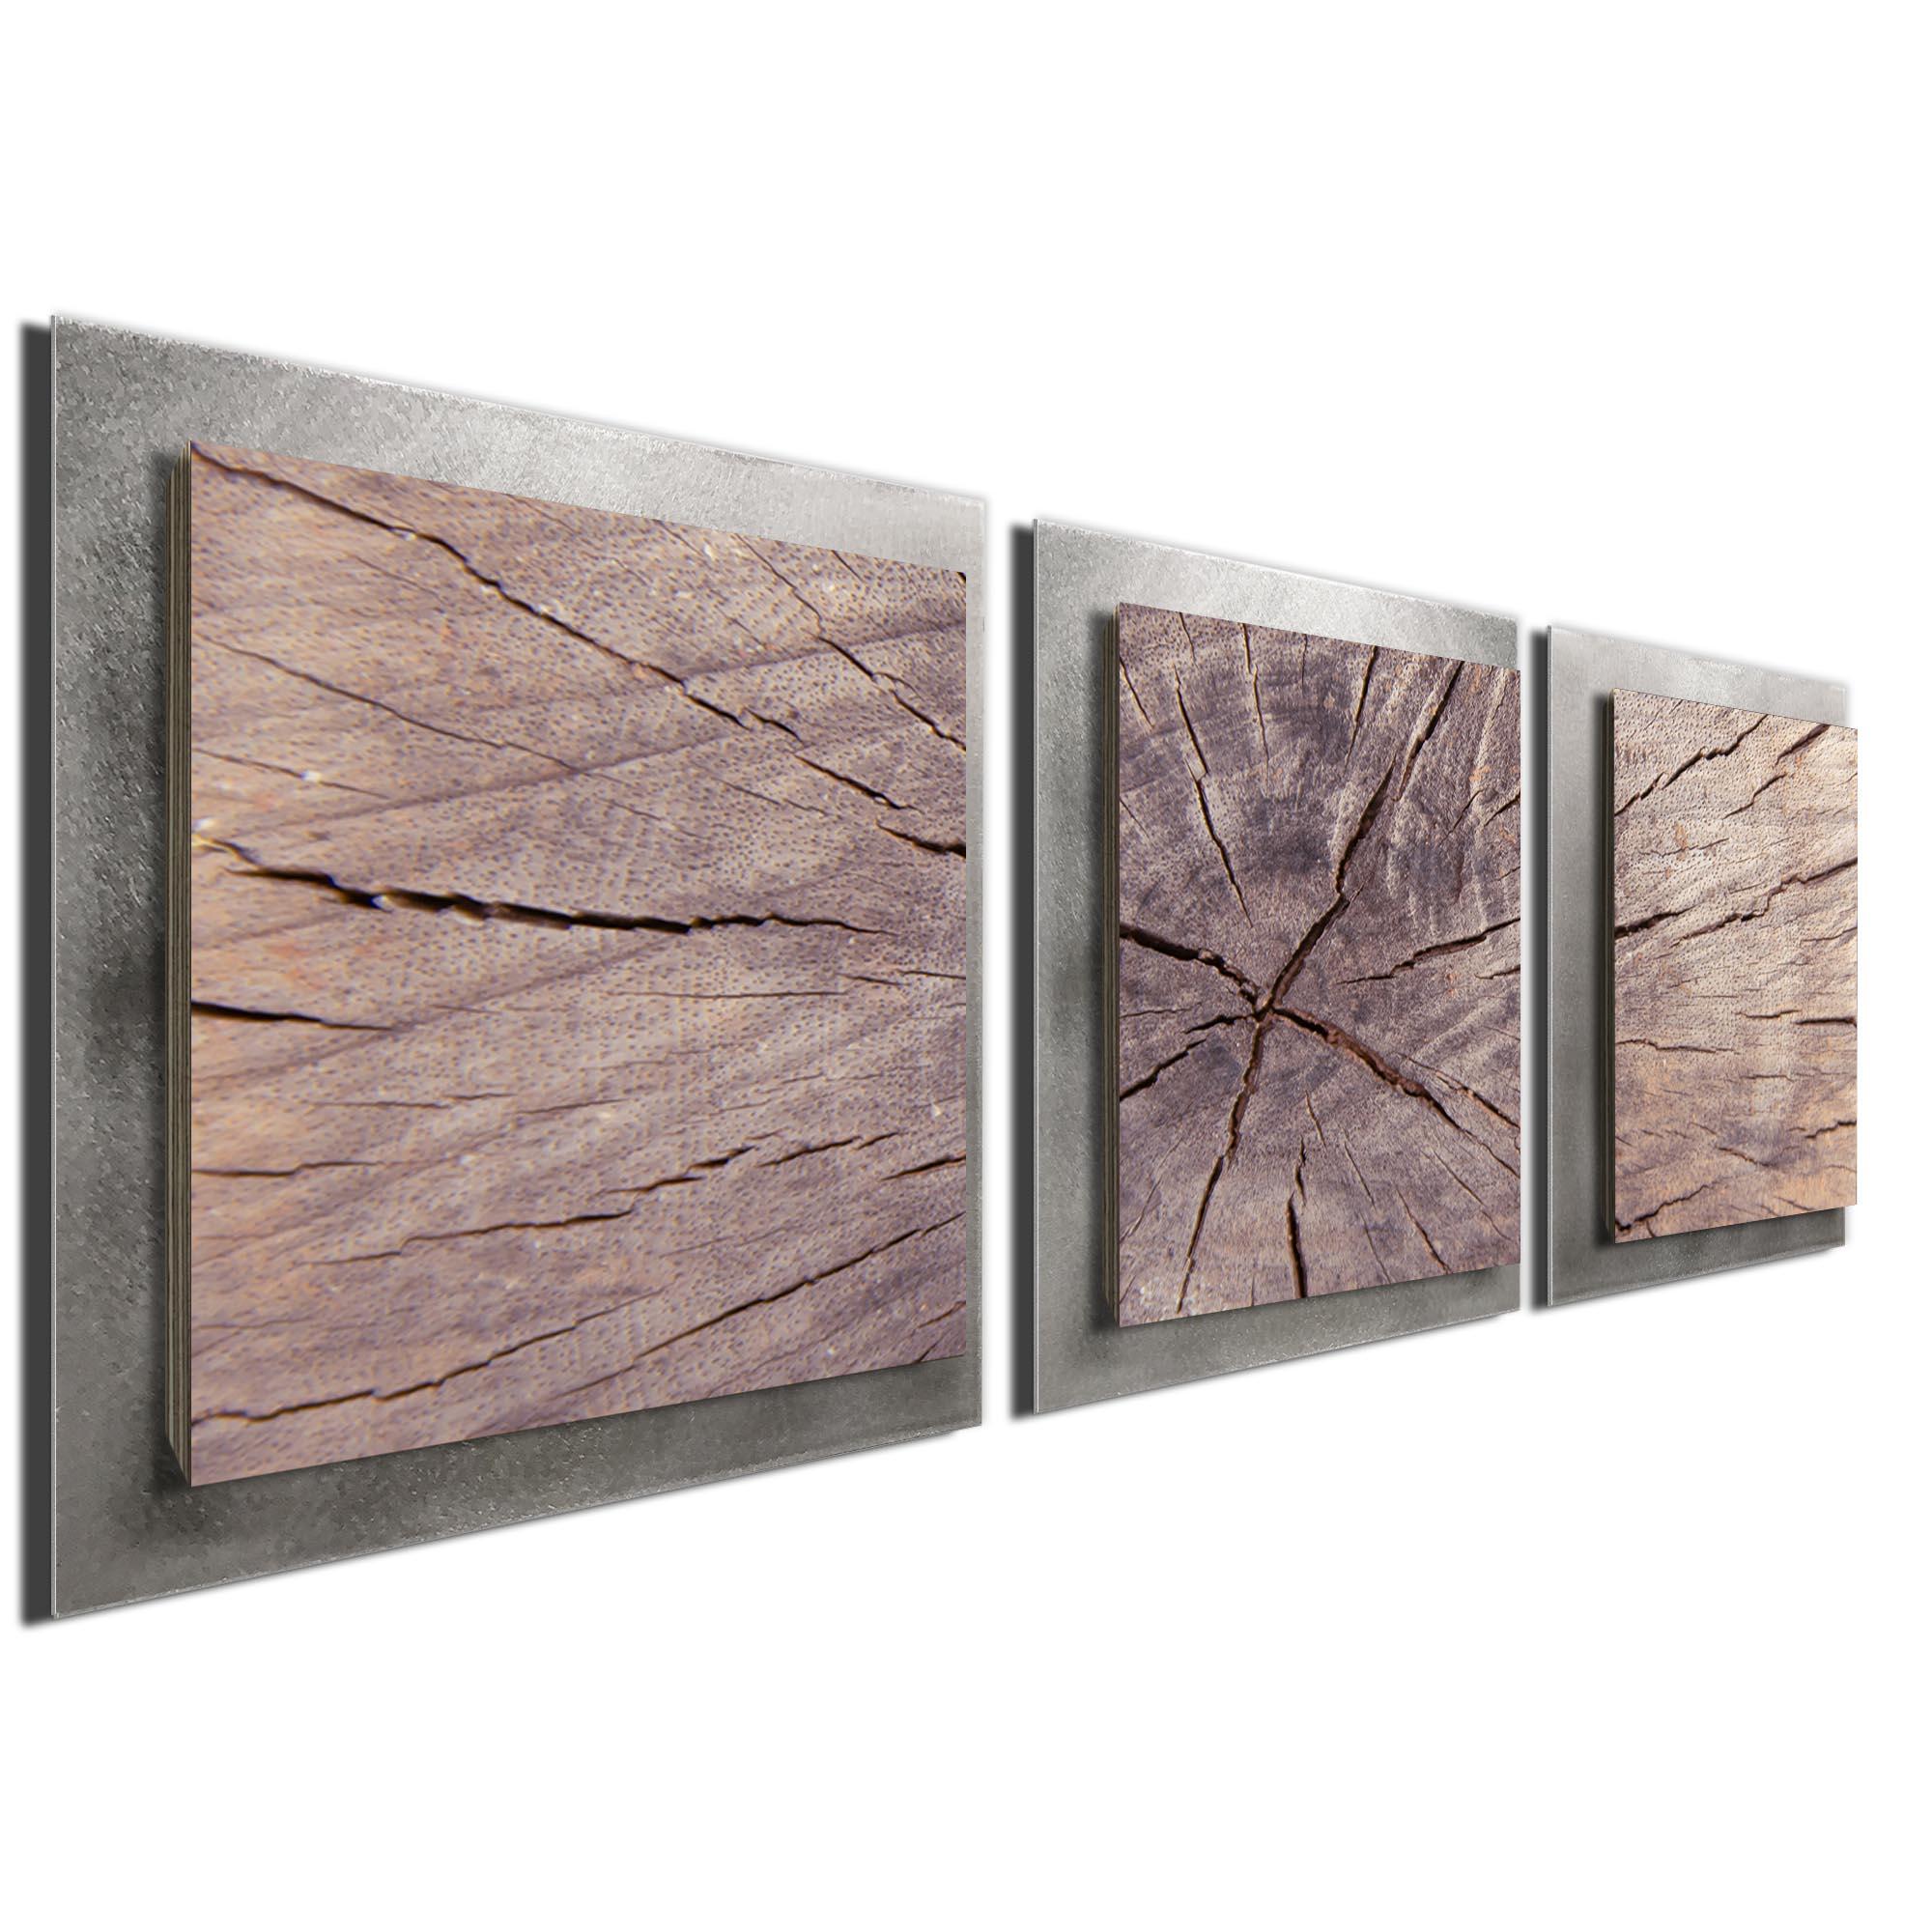 Cracked Wood Essence Silver by Adam Schwoeppe Rustic Modern Style Wood Wall Art - Image 2